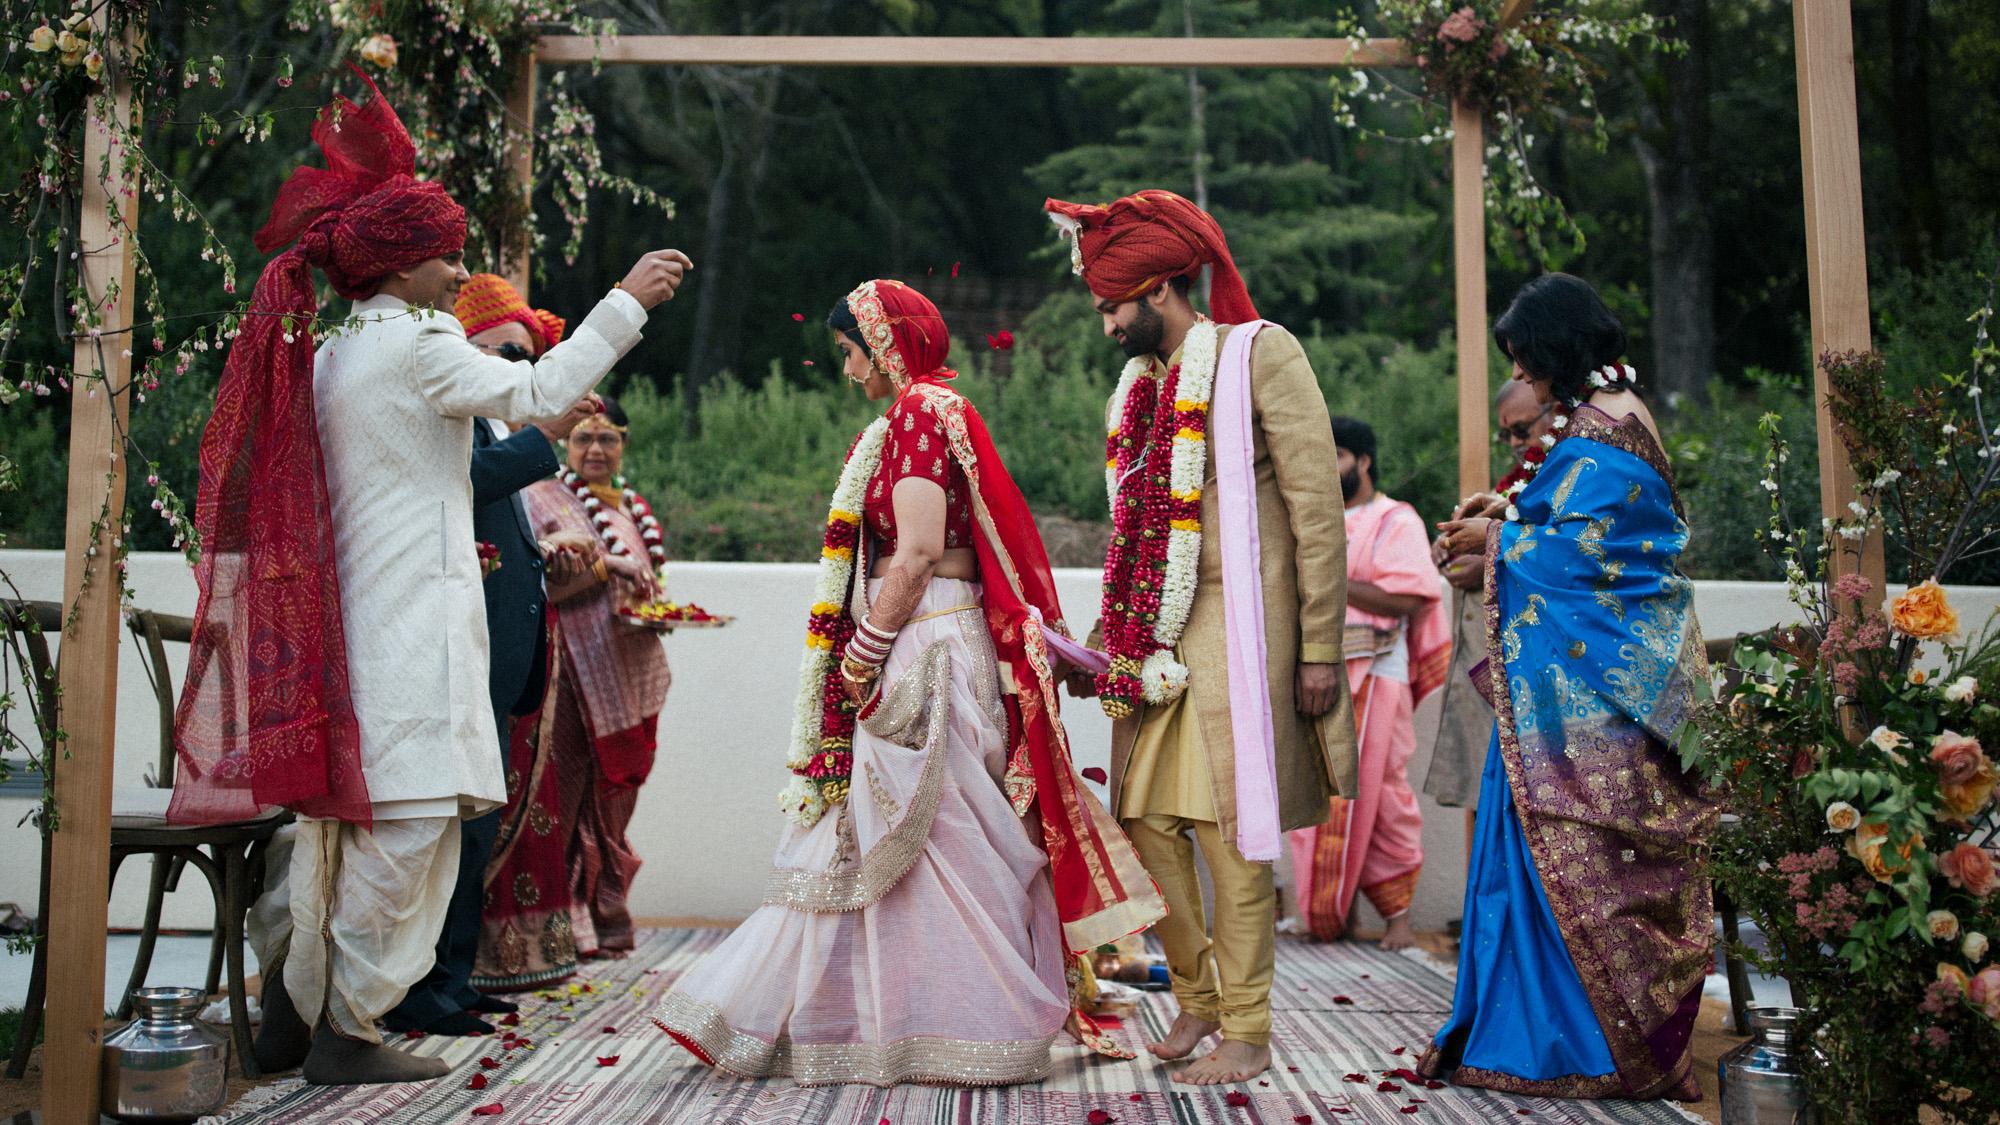 anu_maneesh_alec_vanderboom_Indian_wedding_photography-0109.jpg